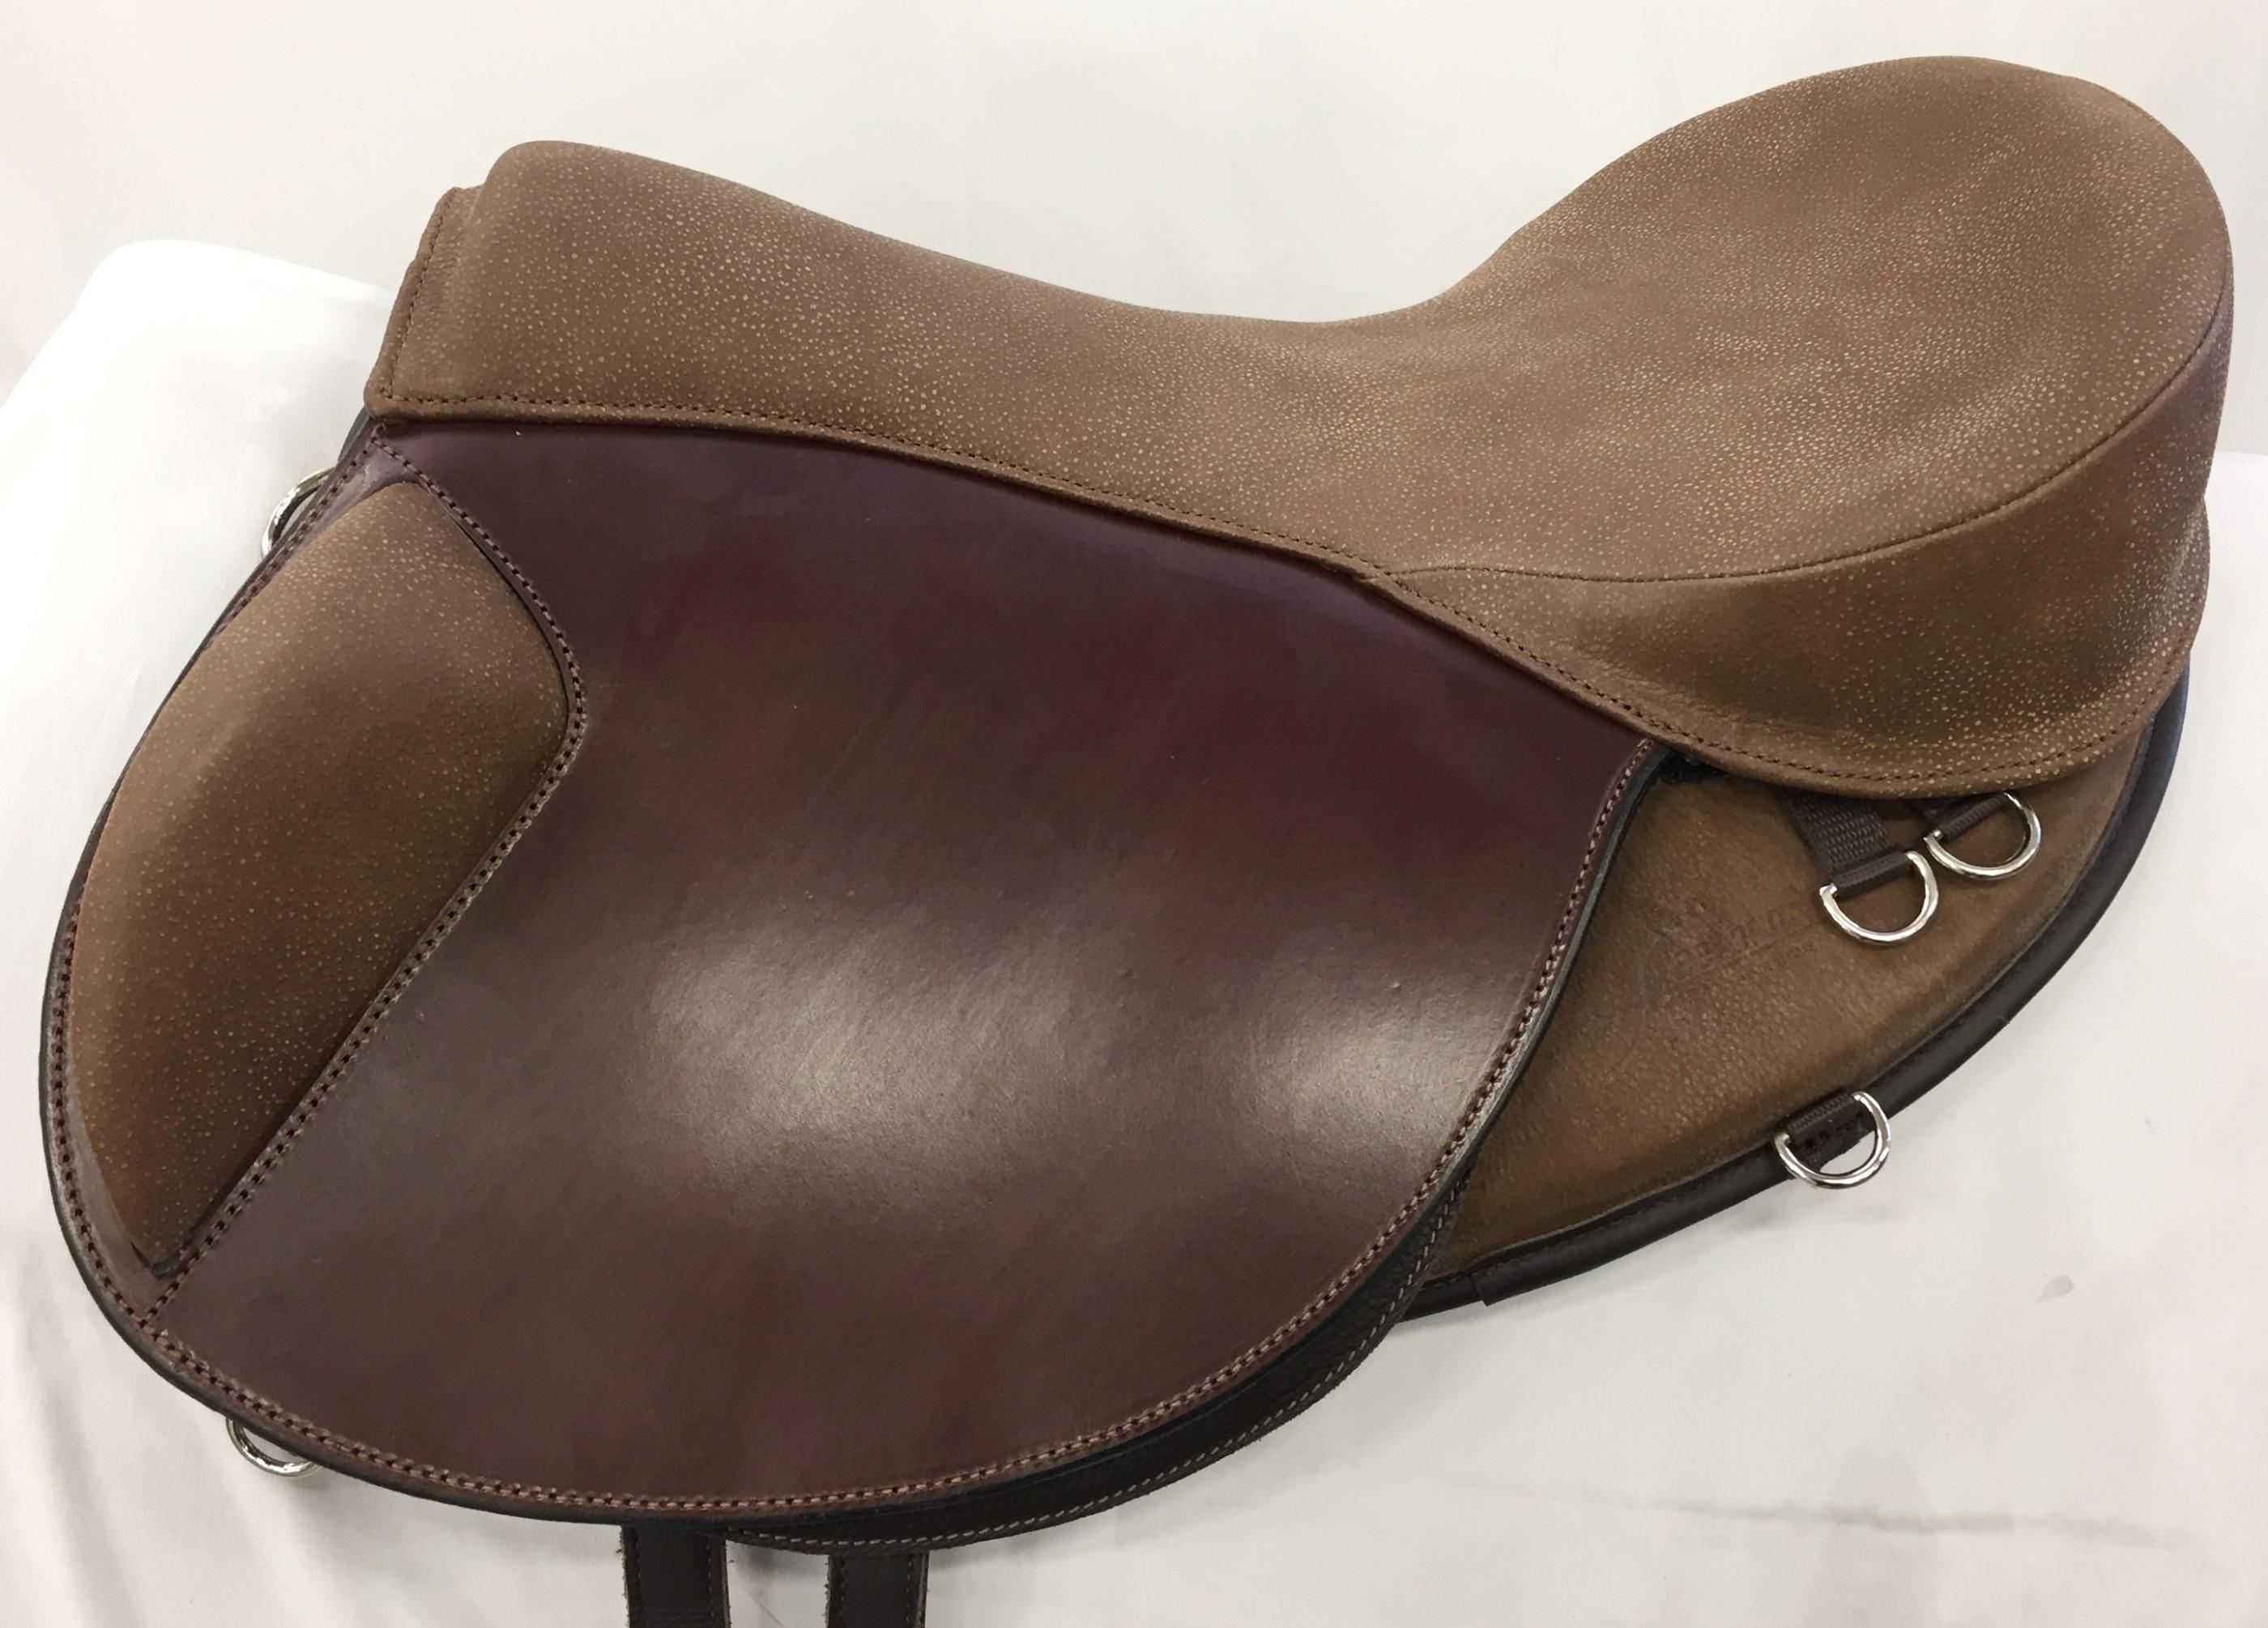 FREST27 ENDURO AUSTRALIA SEAT 1 (1)